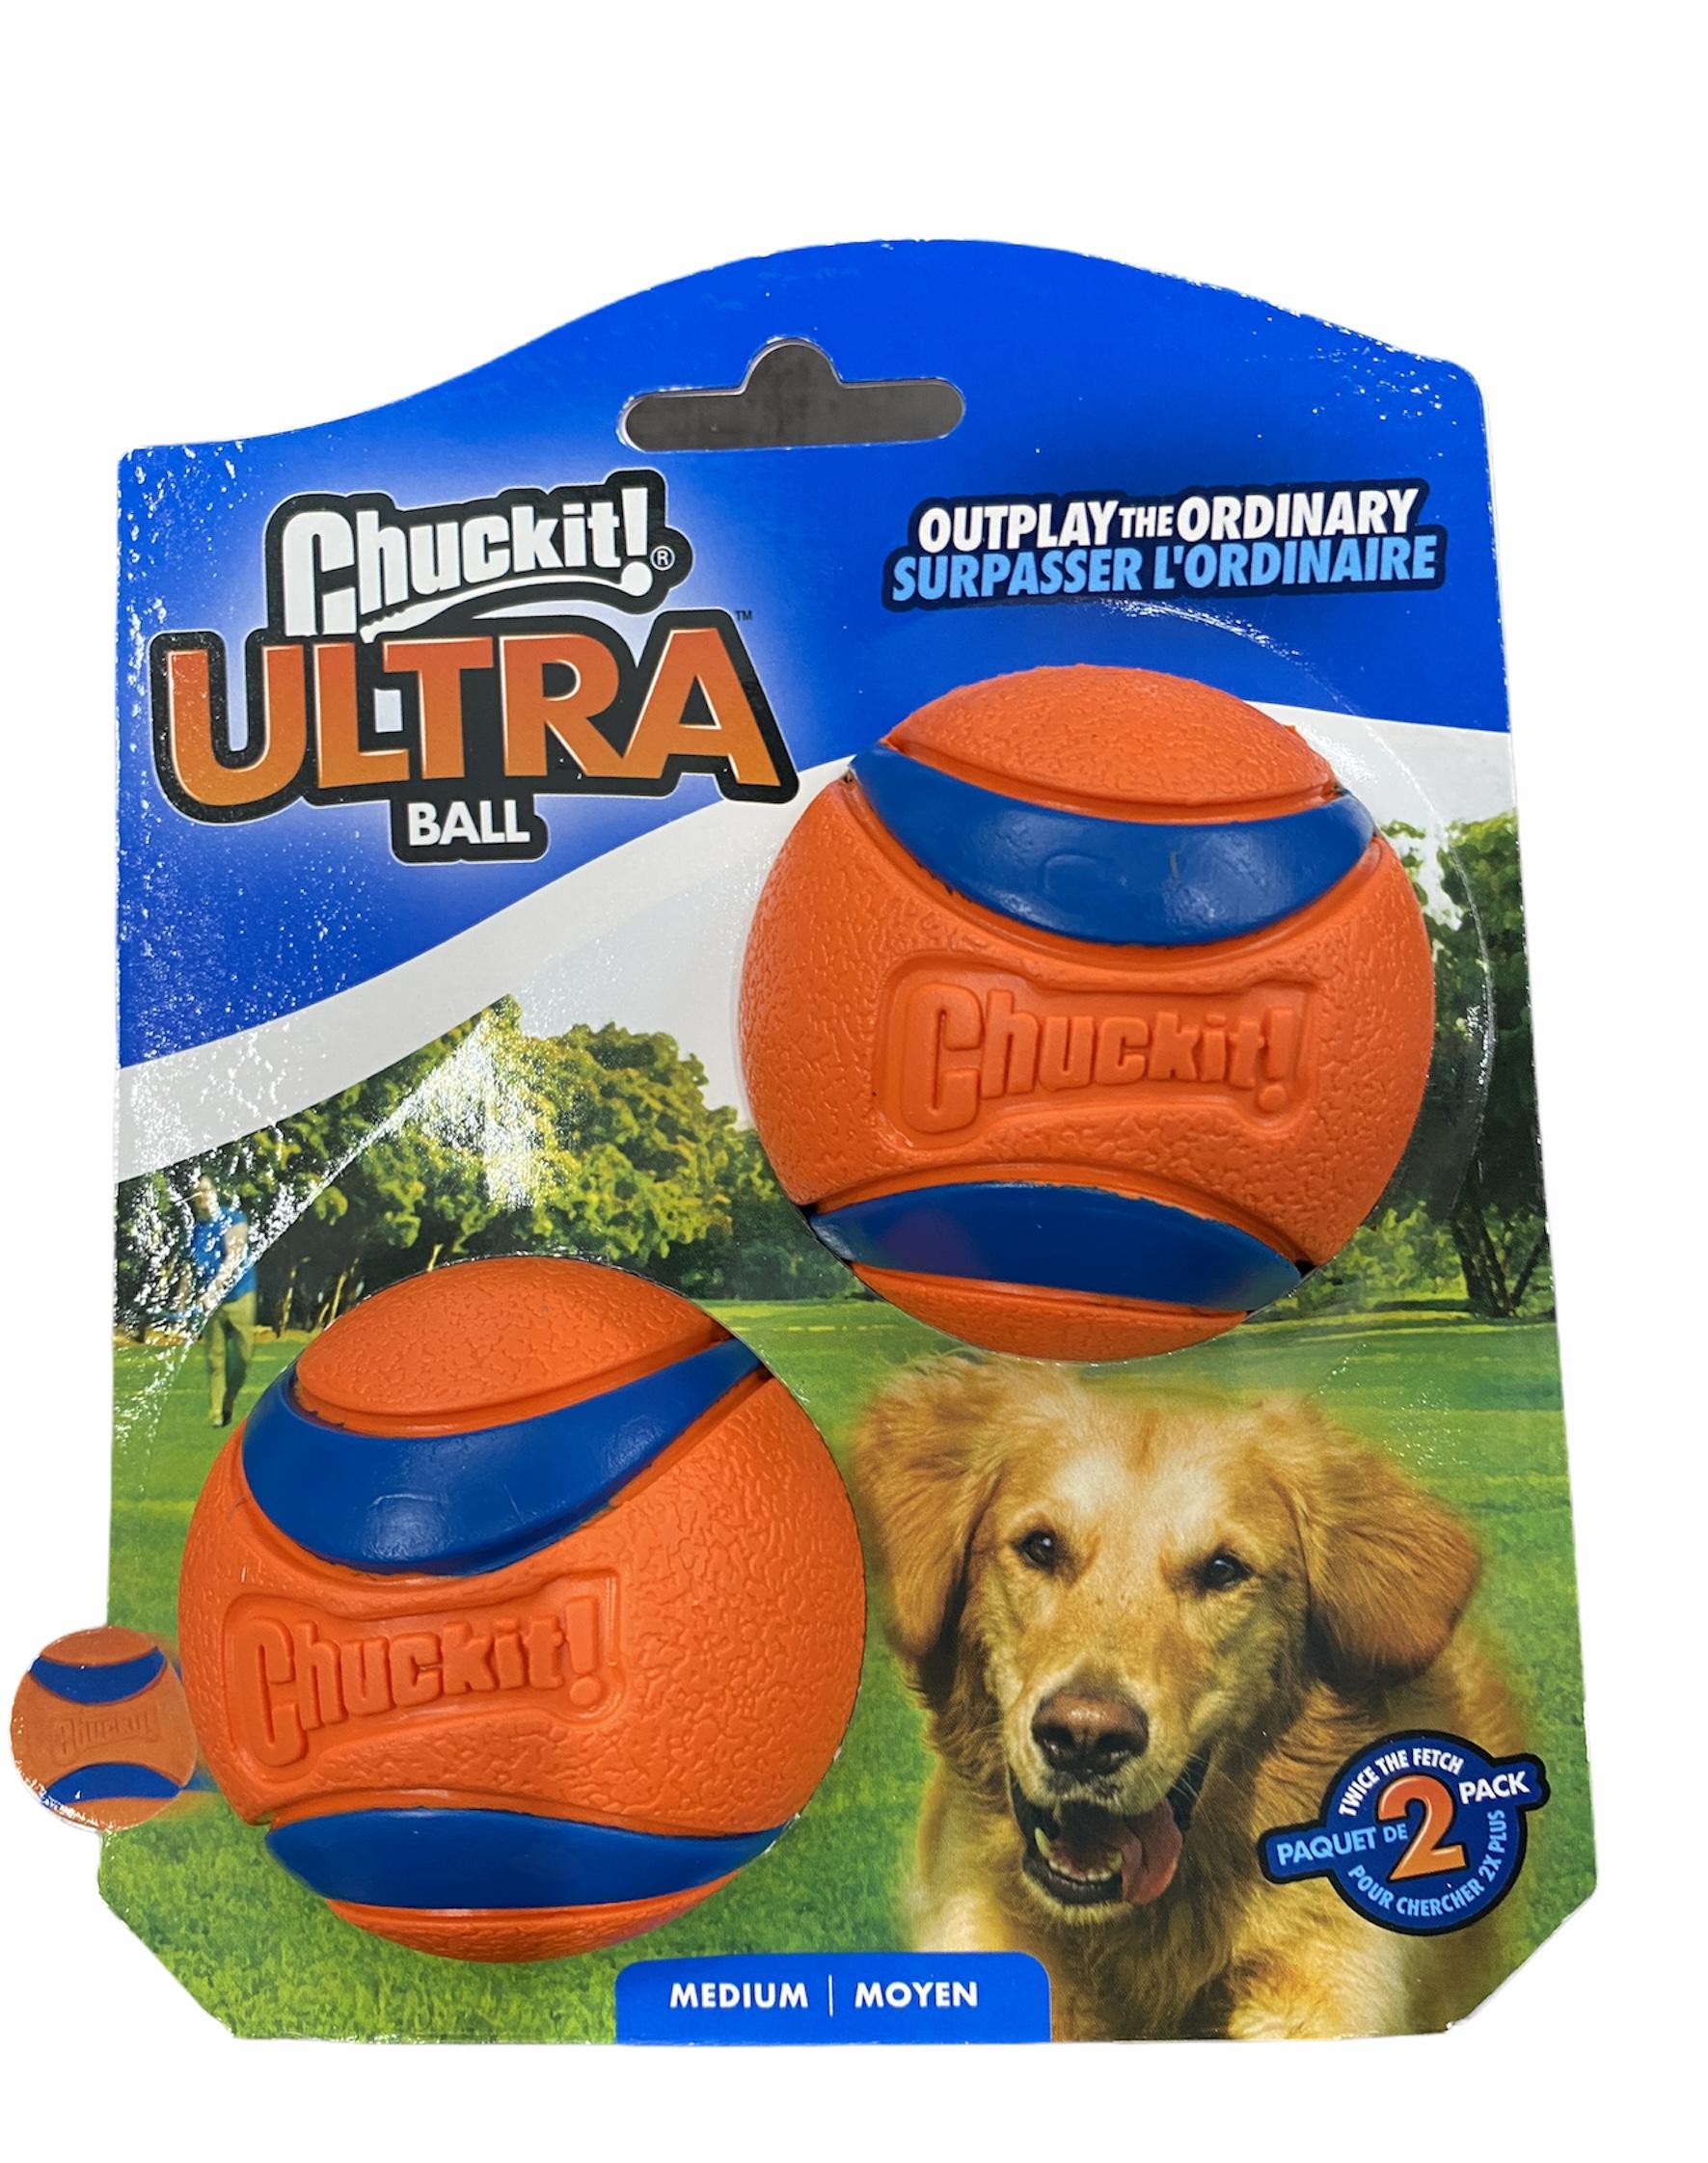 Chuckit Ultra Ball